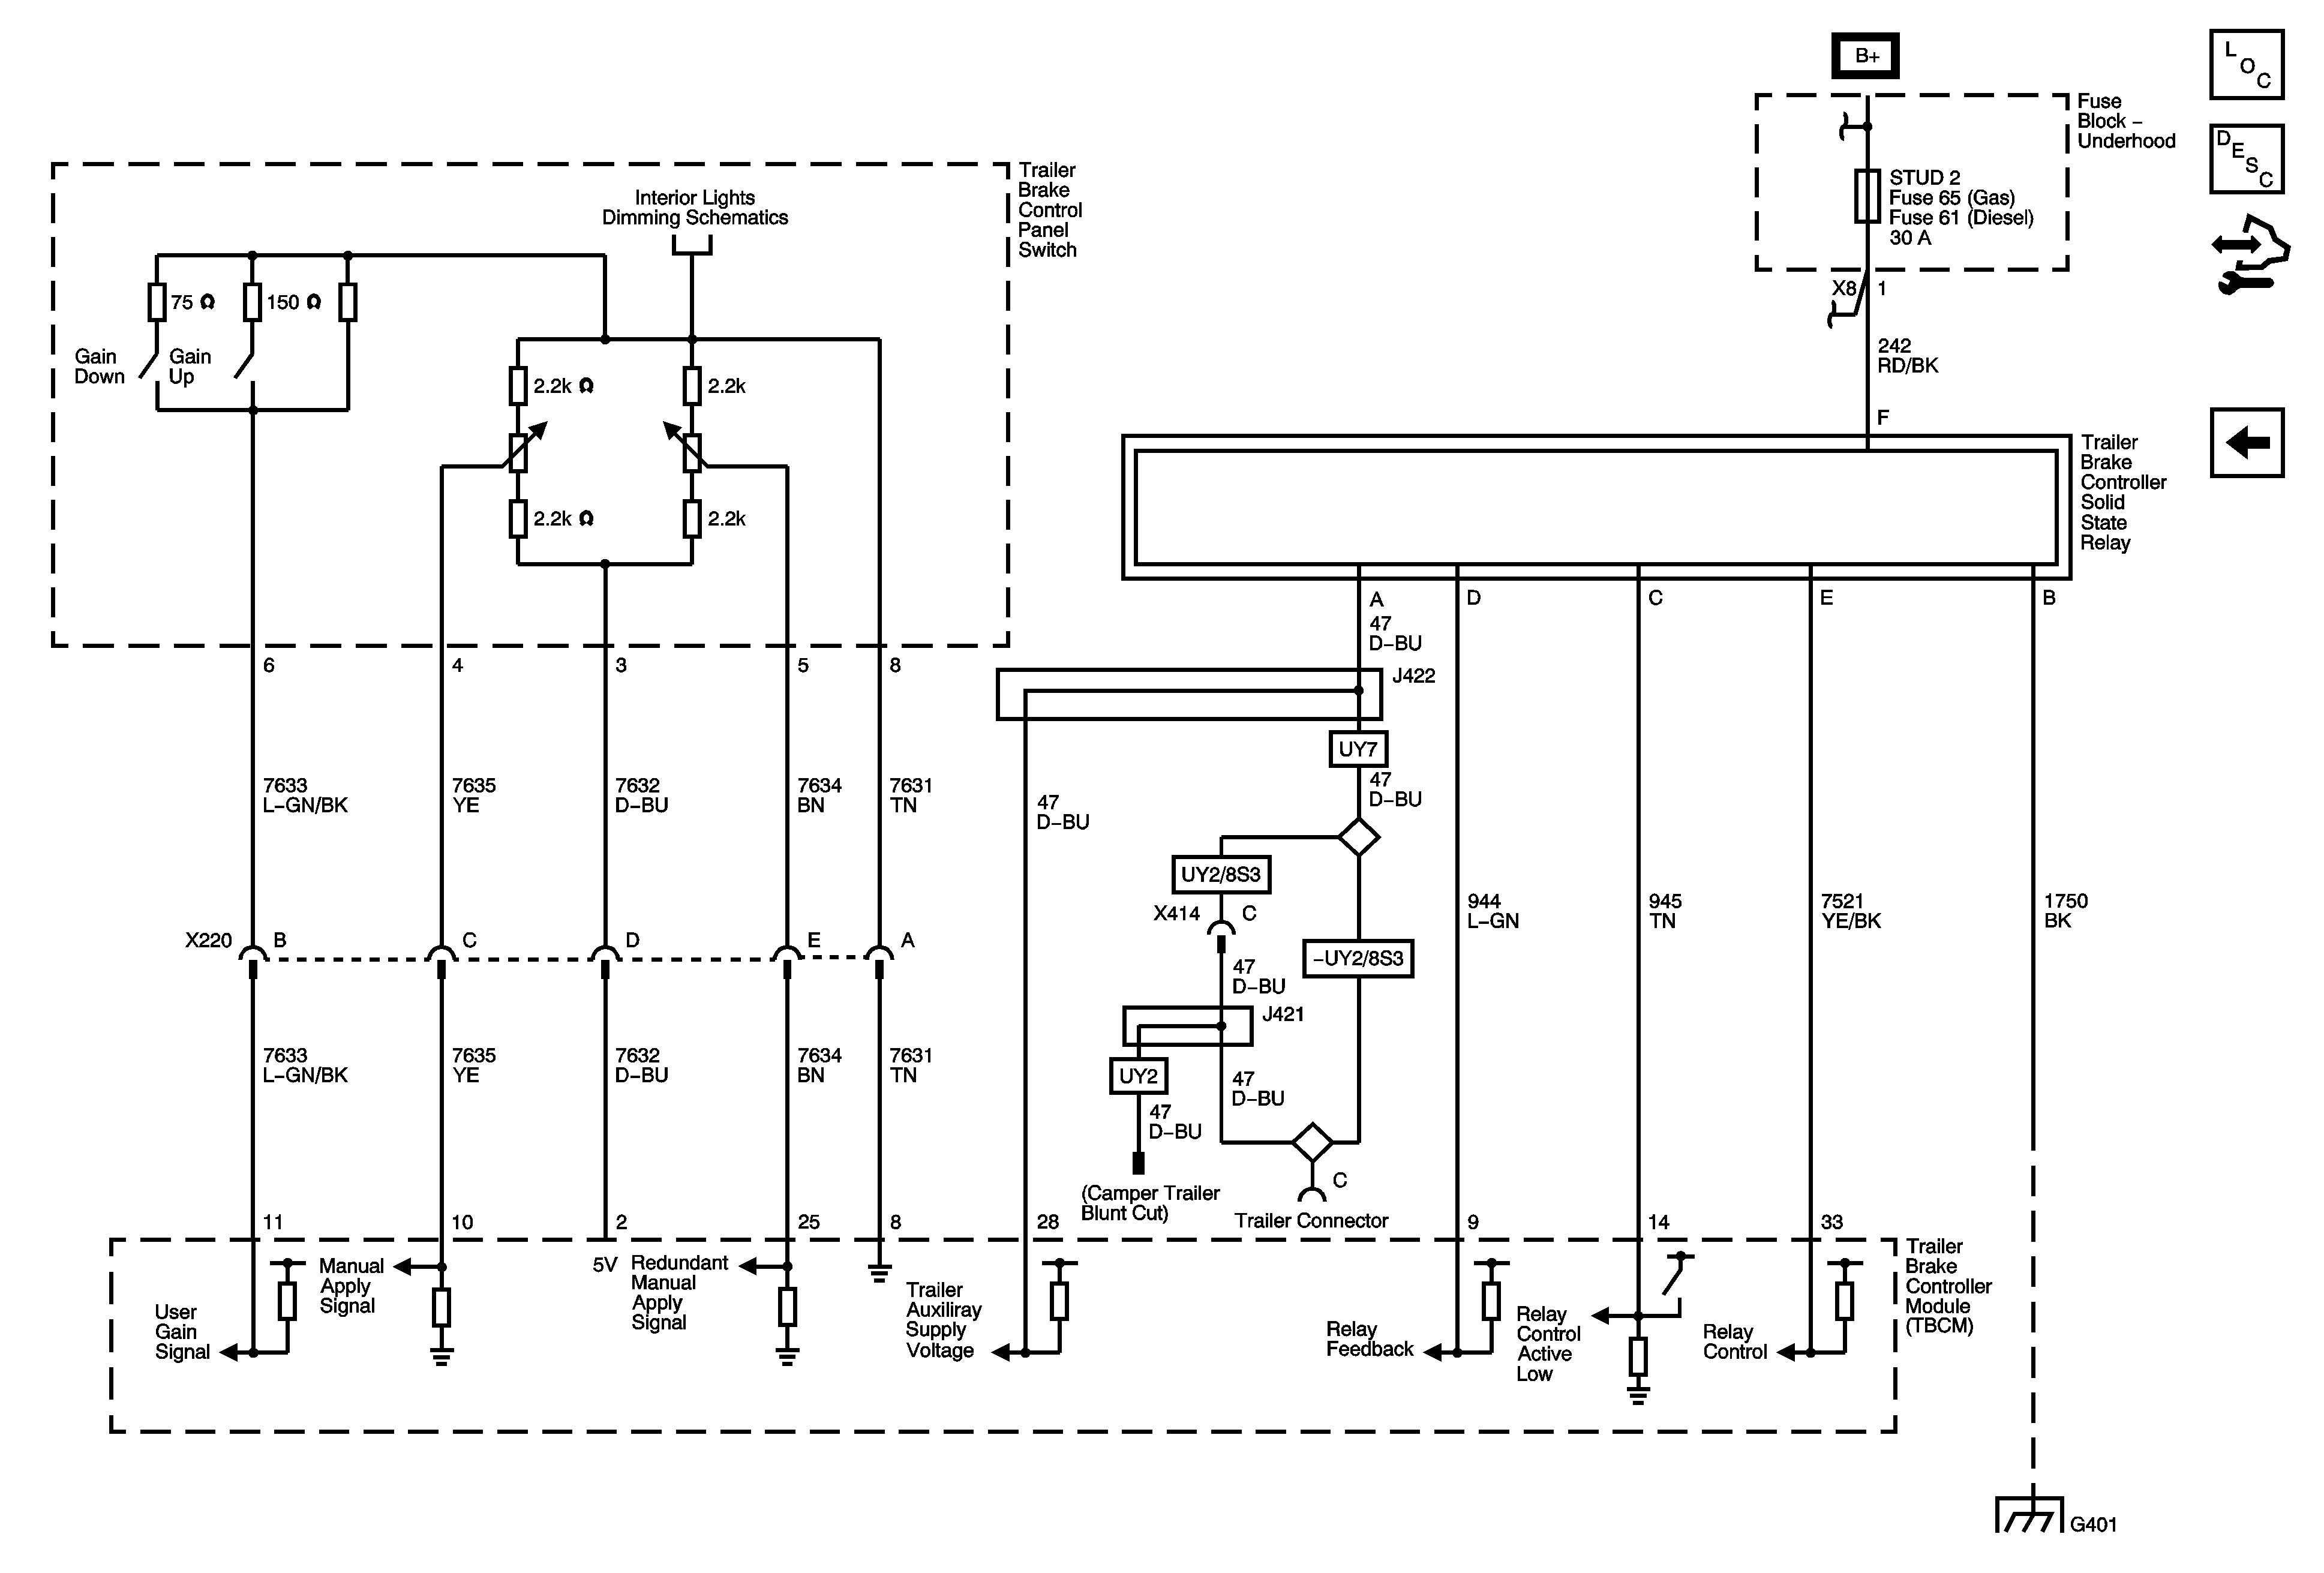 1995 Chevy Silverado Wiring Diagram Inspirational Awesome 1995 Chevy Silverado Wiring Diagram 20 In 6 Wire